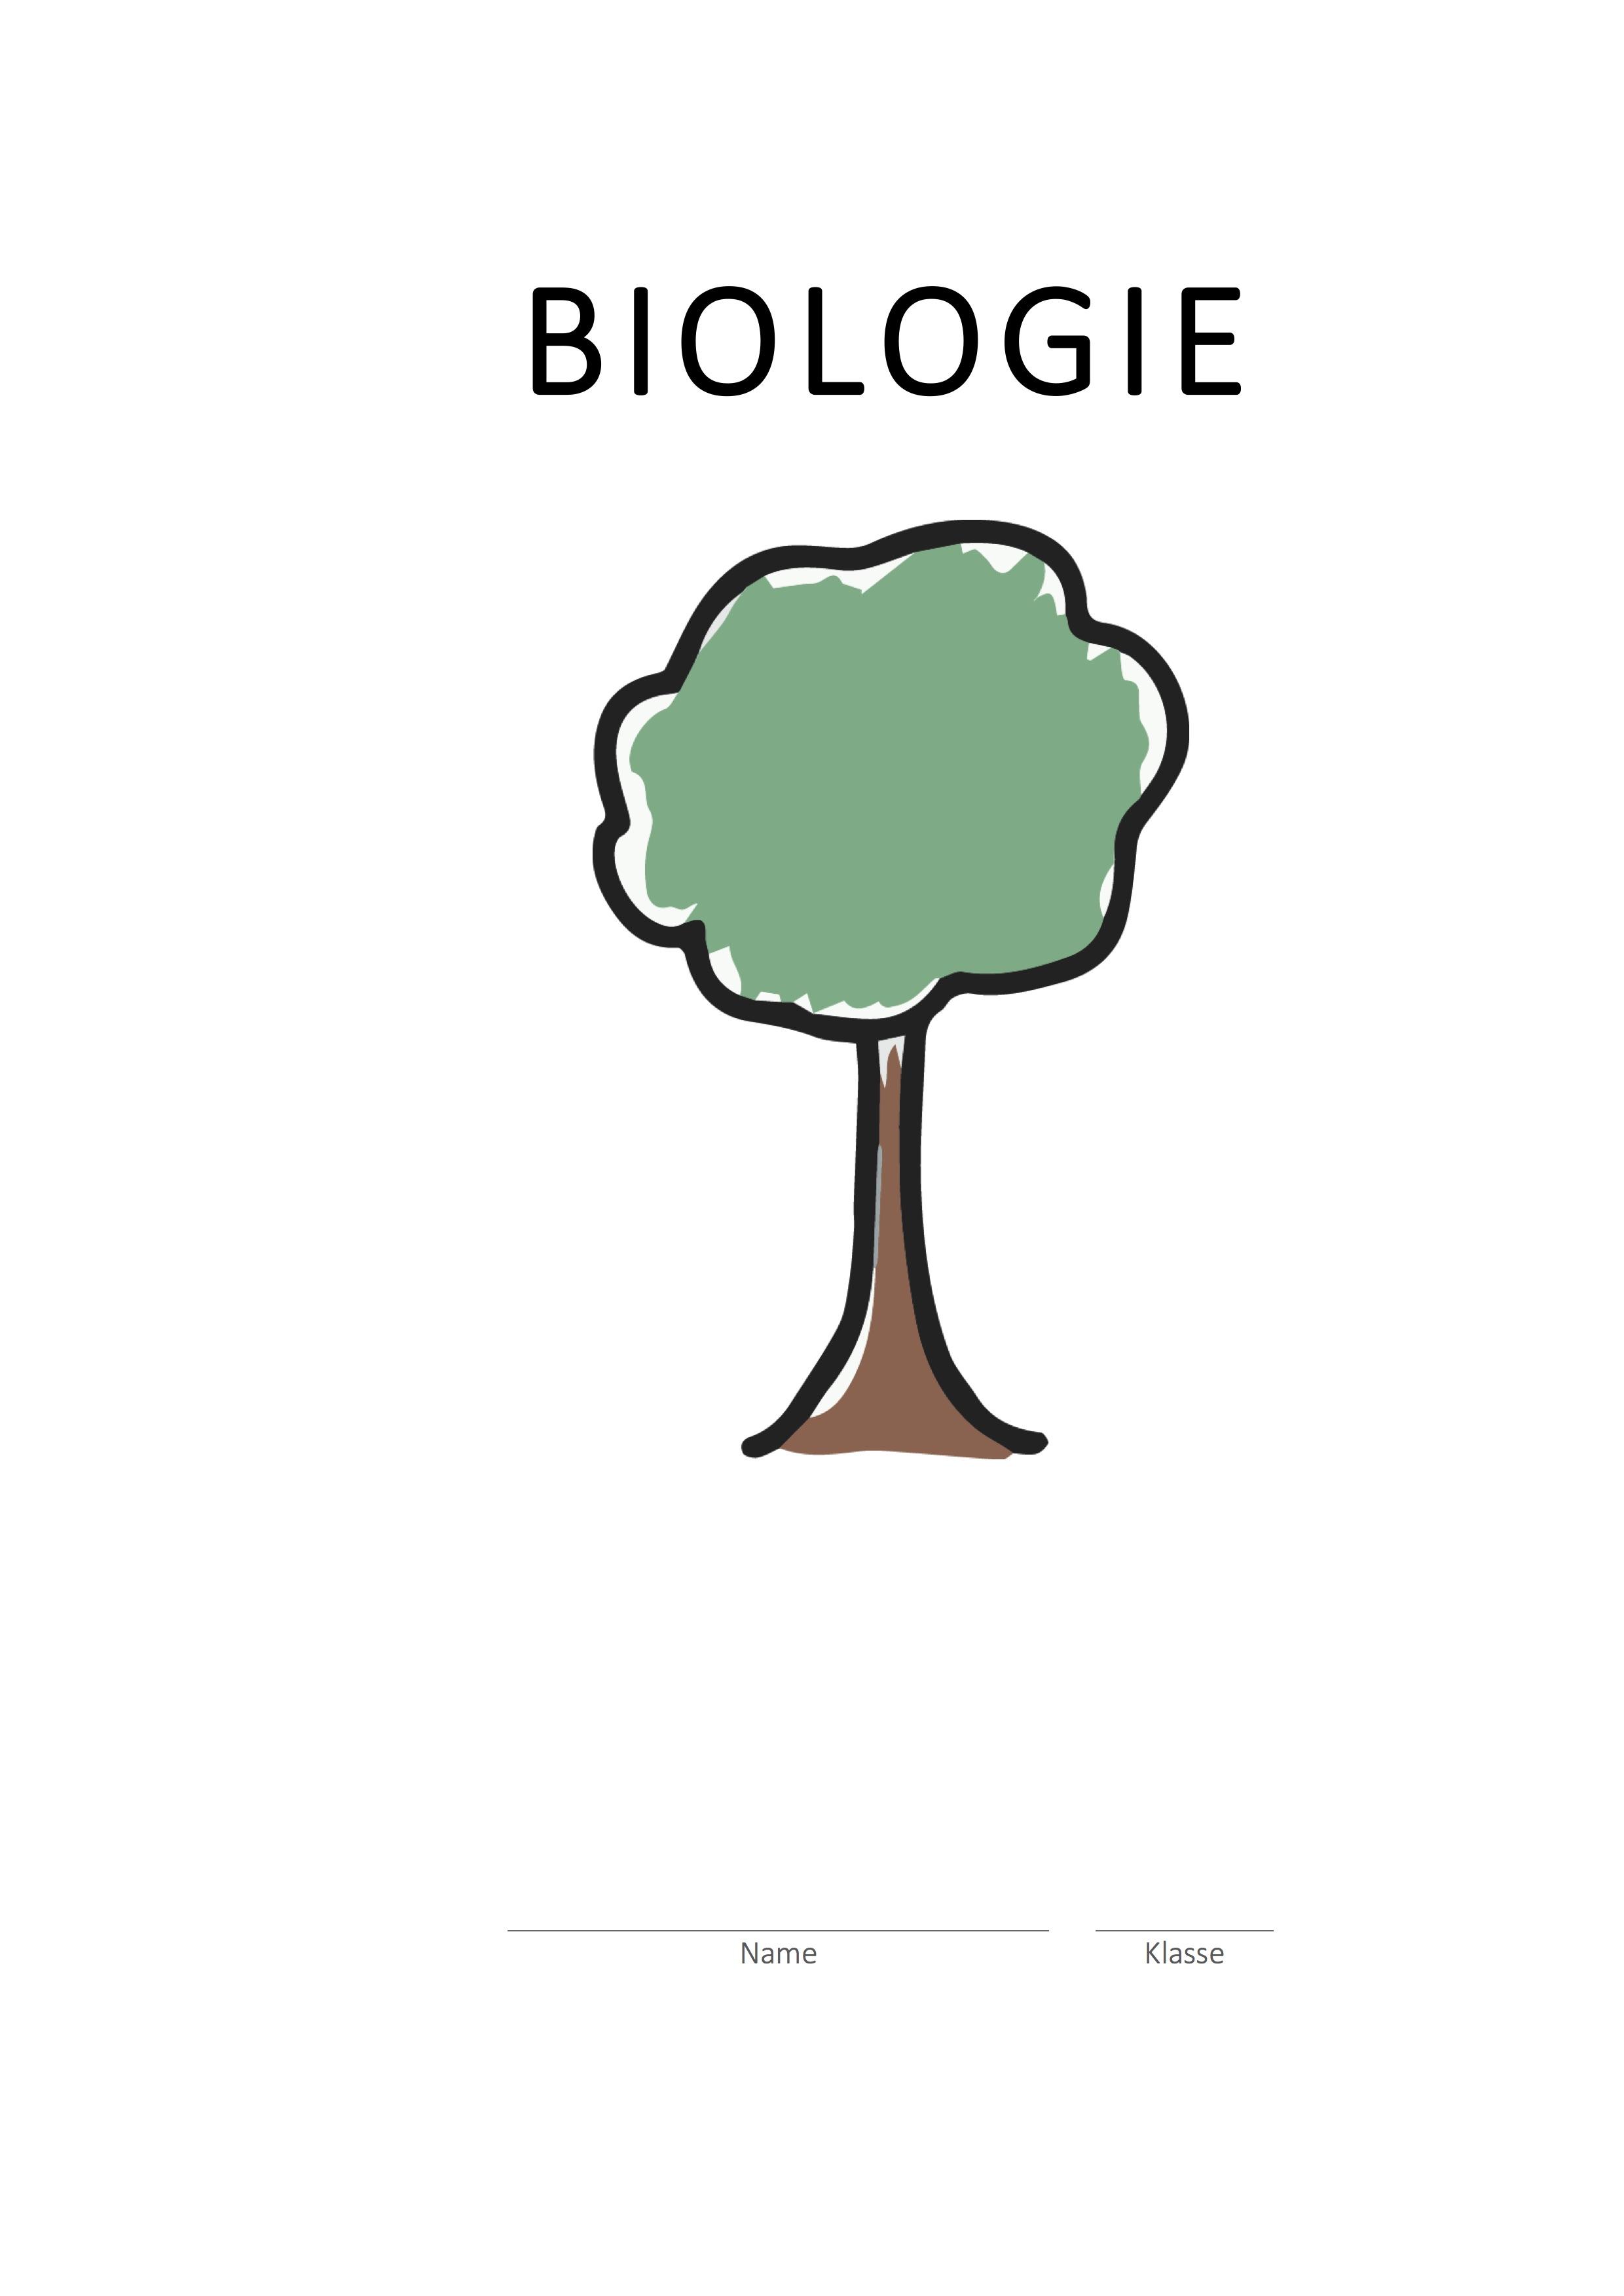 Deckblatt Schule Biologie Baum Vorschaubild | CONVICTORIUS